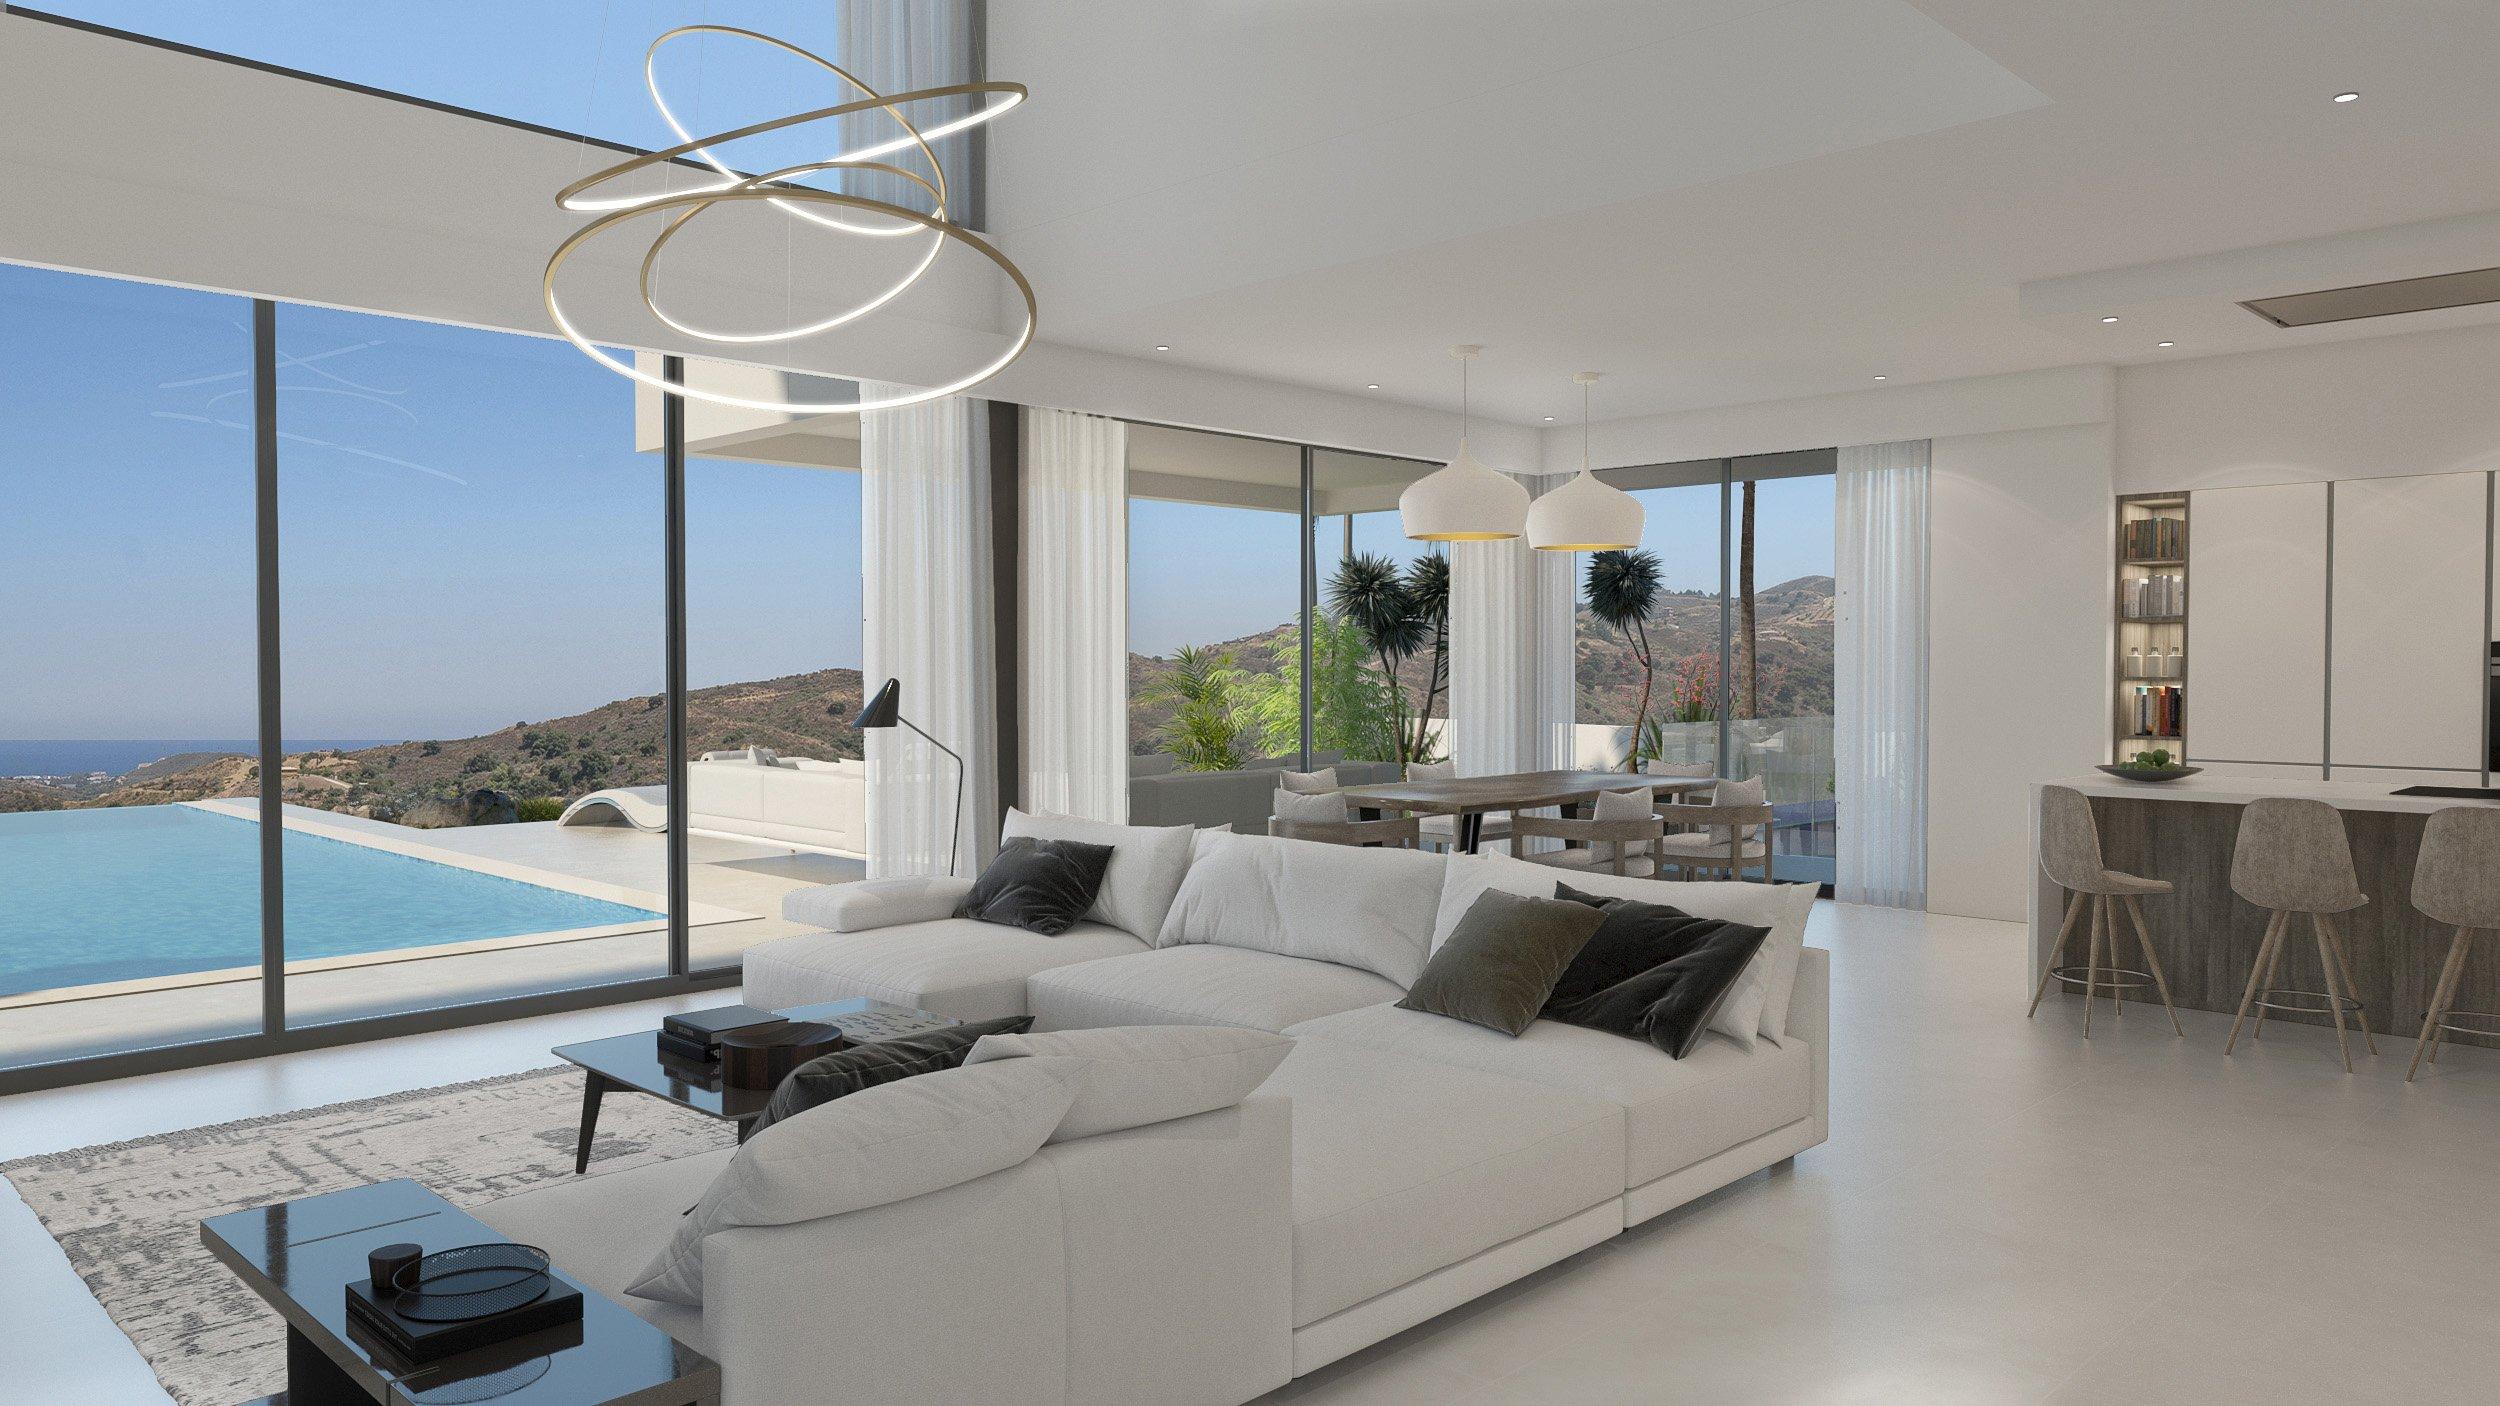 Villa Cala Golf 44: Golf villa with stunning views in La Cala Golf